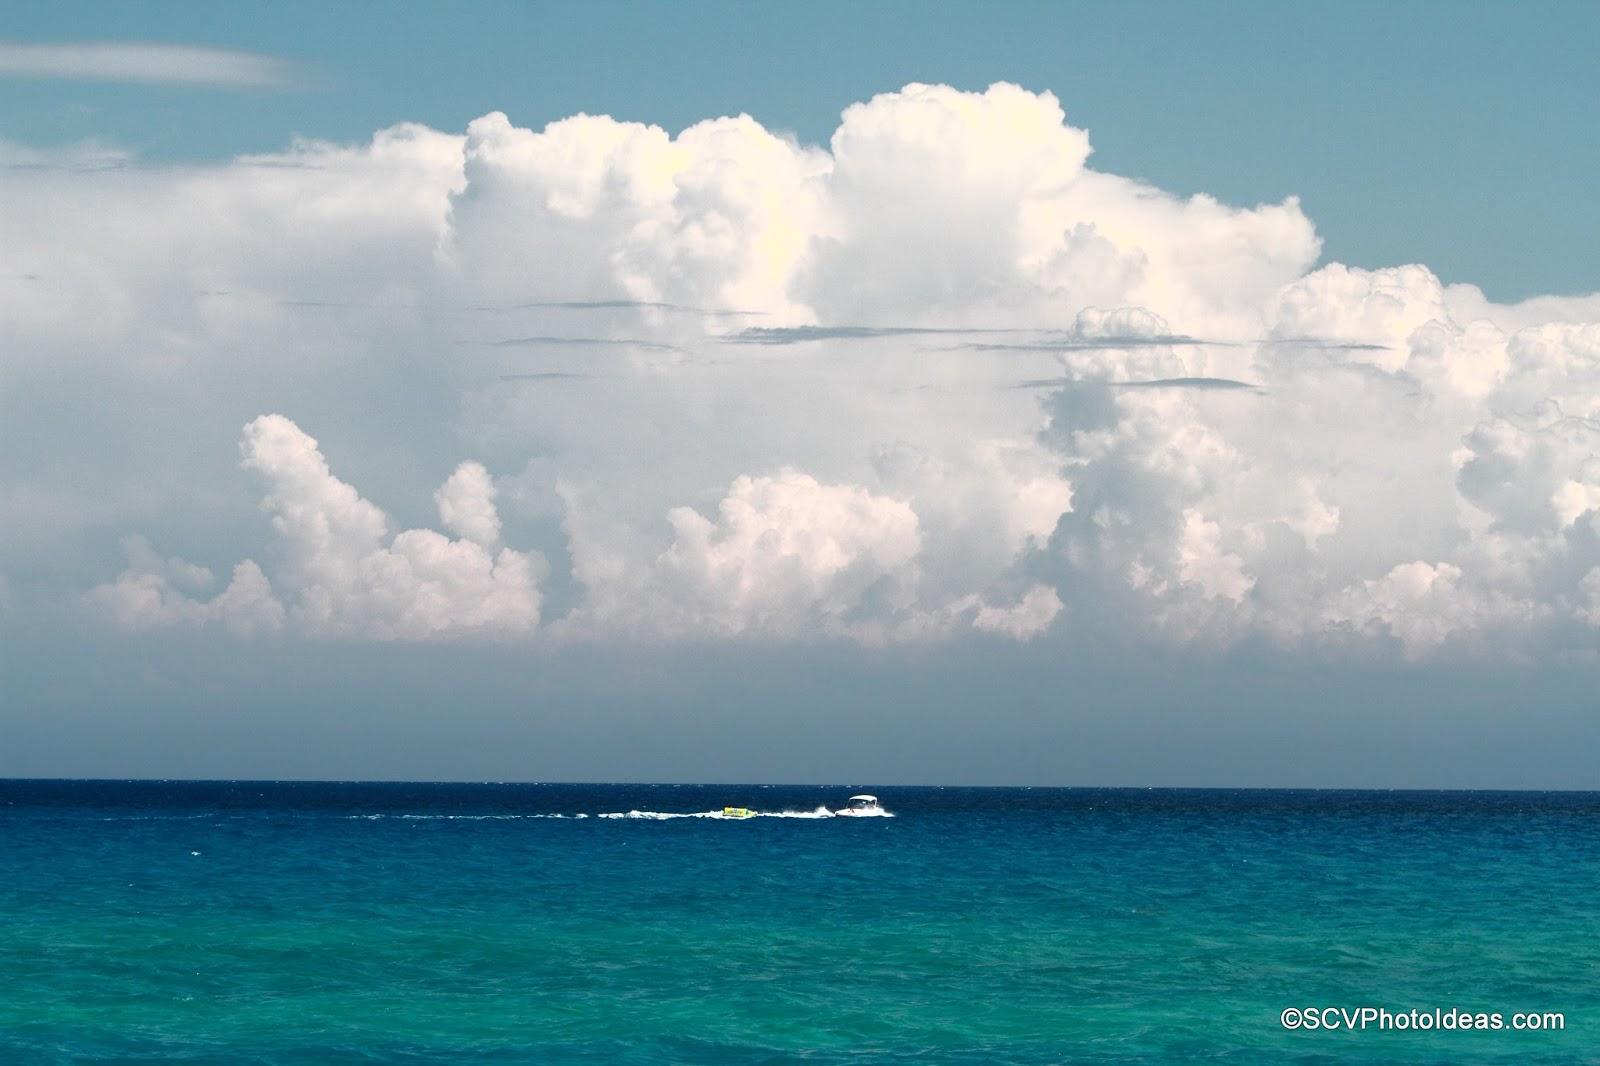 Green Blue Sea Waters at Skala Kefalonia III